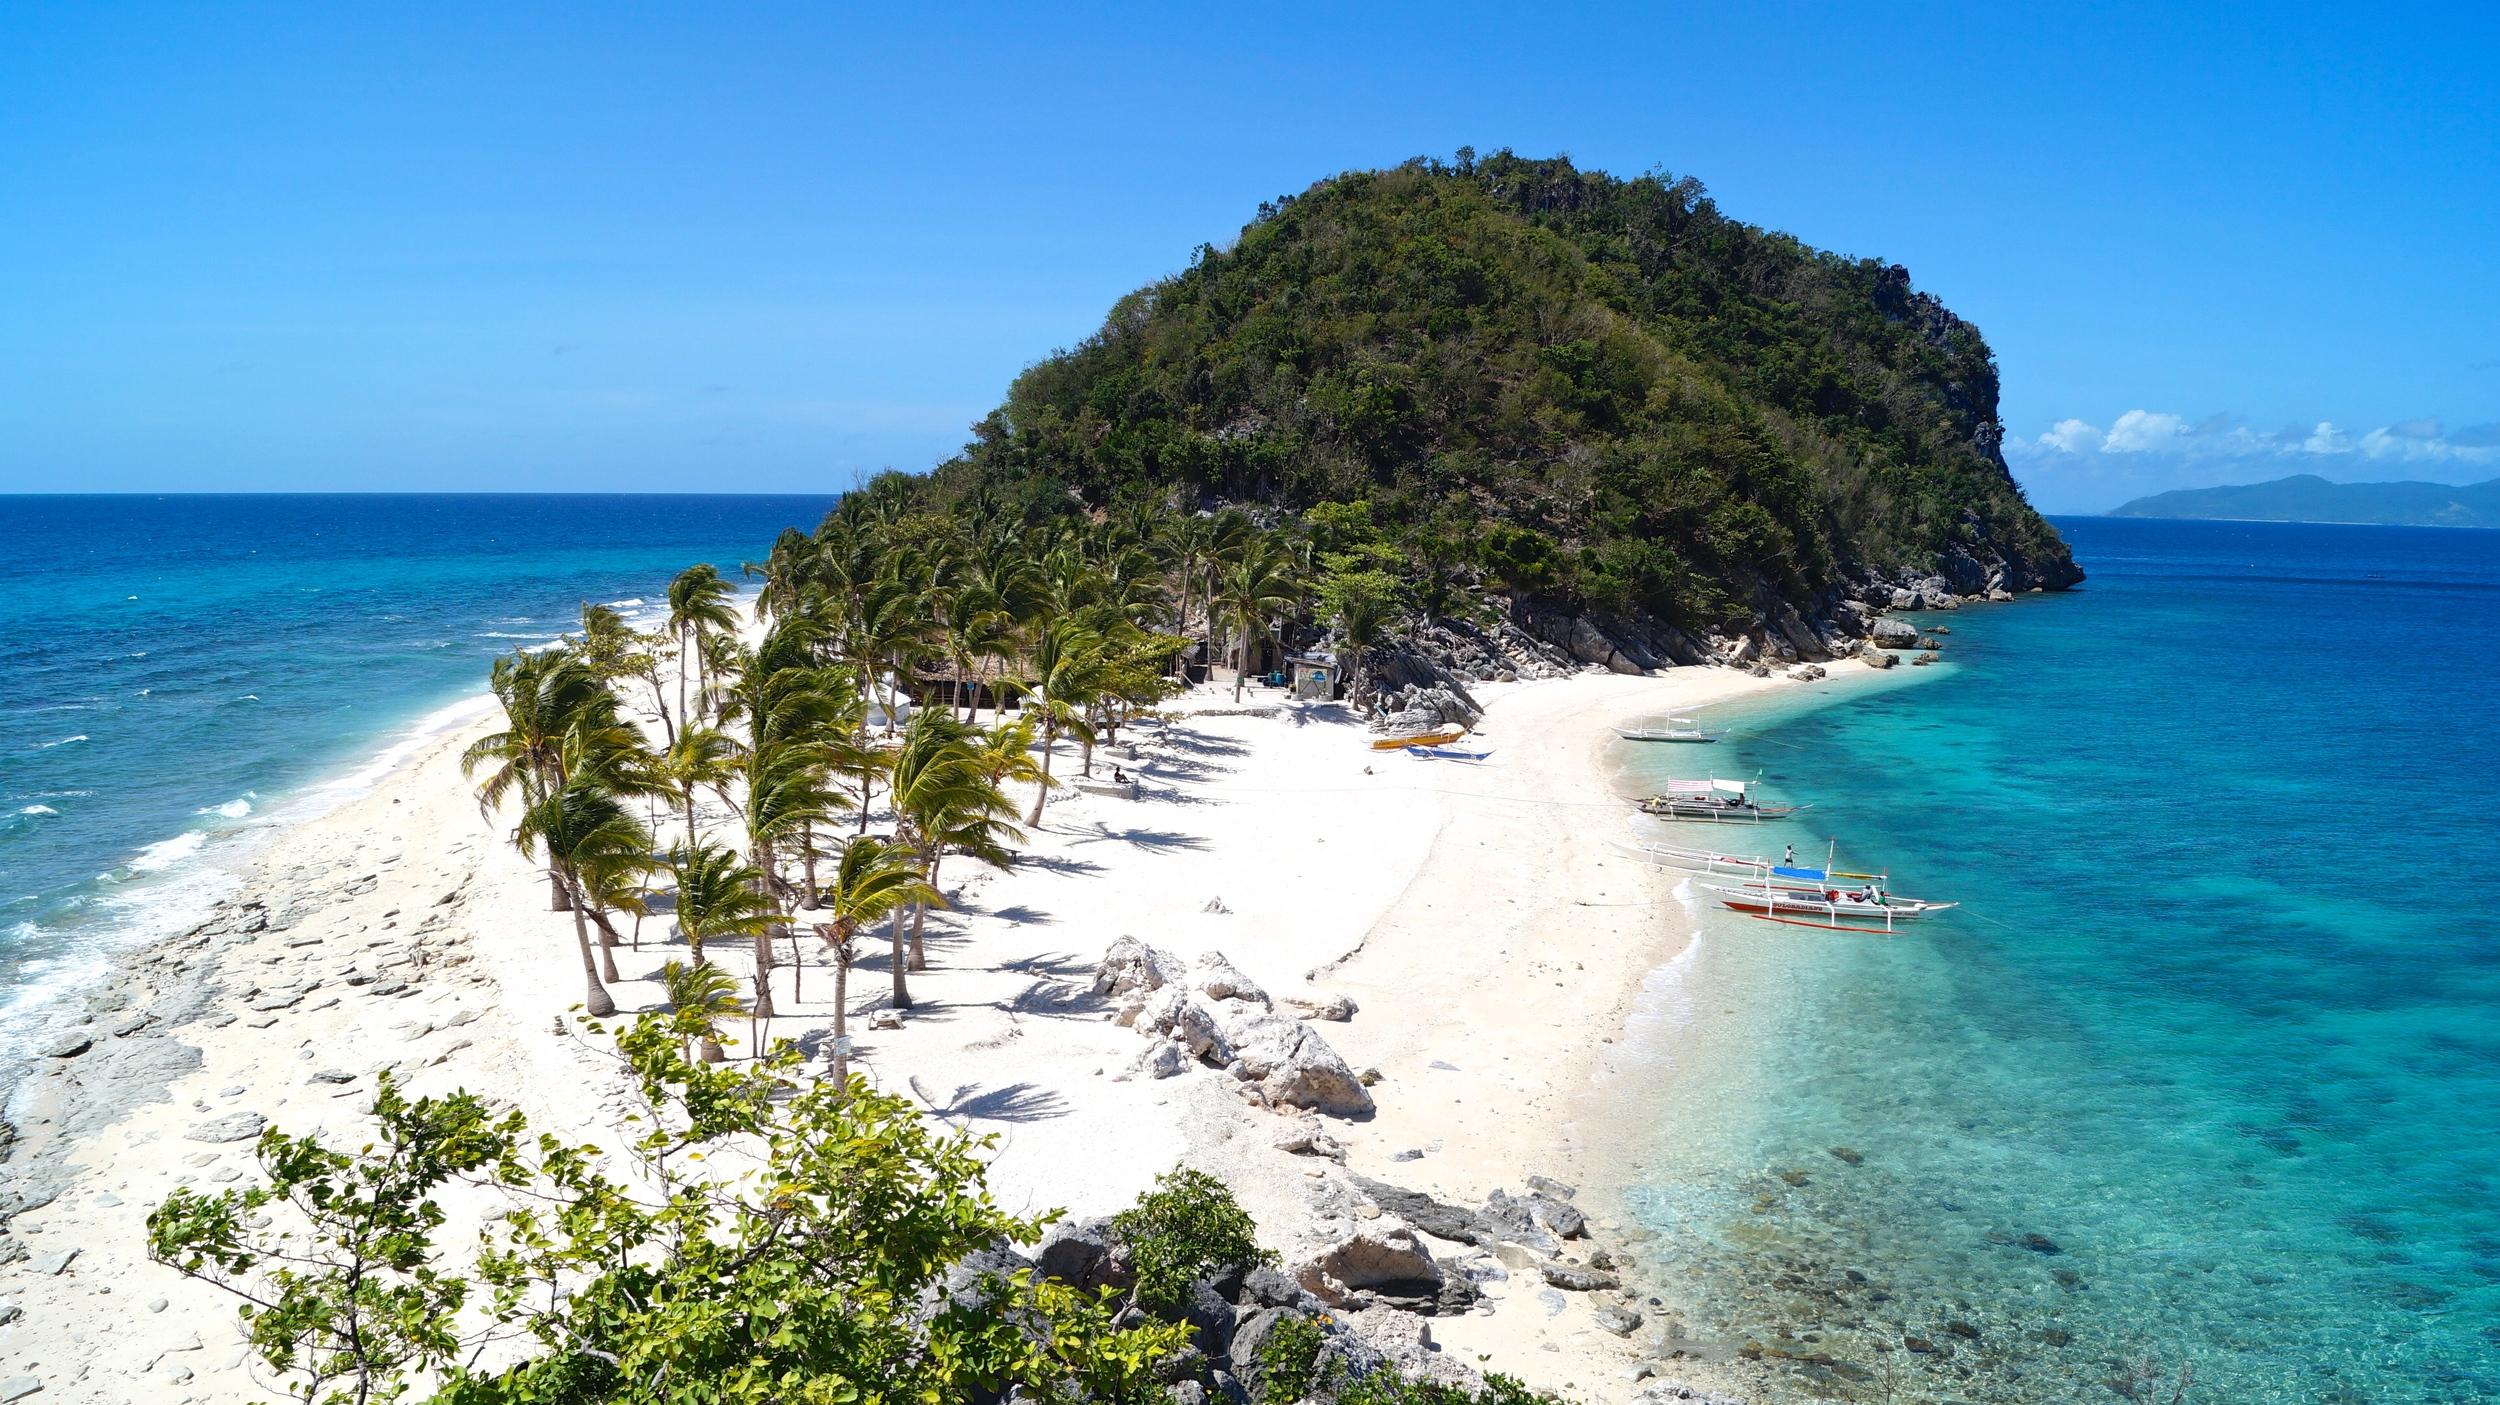 "远离网格- Islas de Gigantes, Cabugao Gamay岛,菲律宾- illumelation.combeplay3体育官方下载"">              </noscript>              <img class="